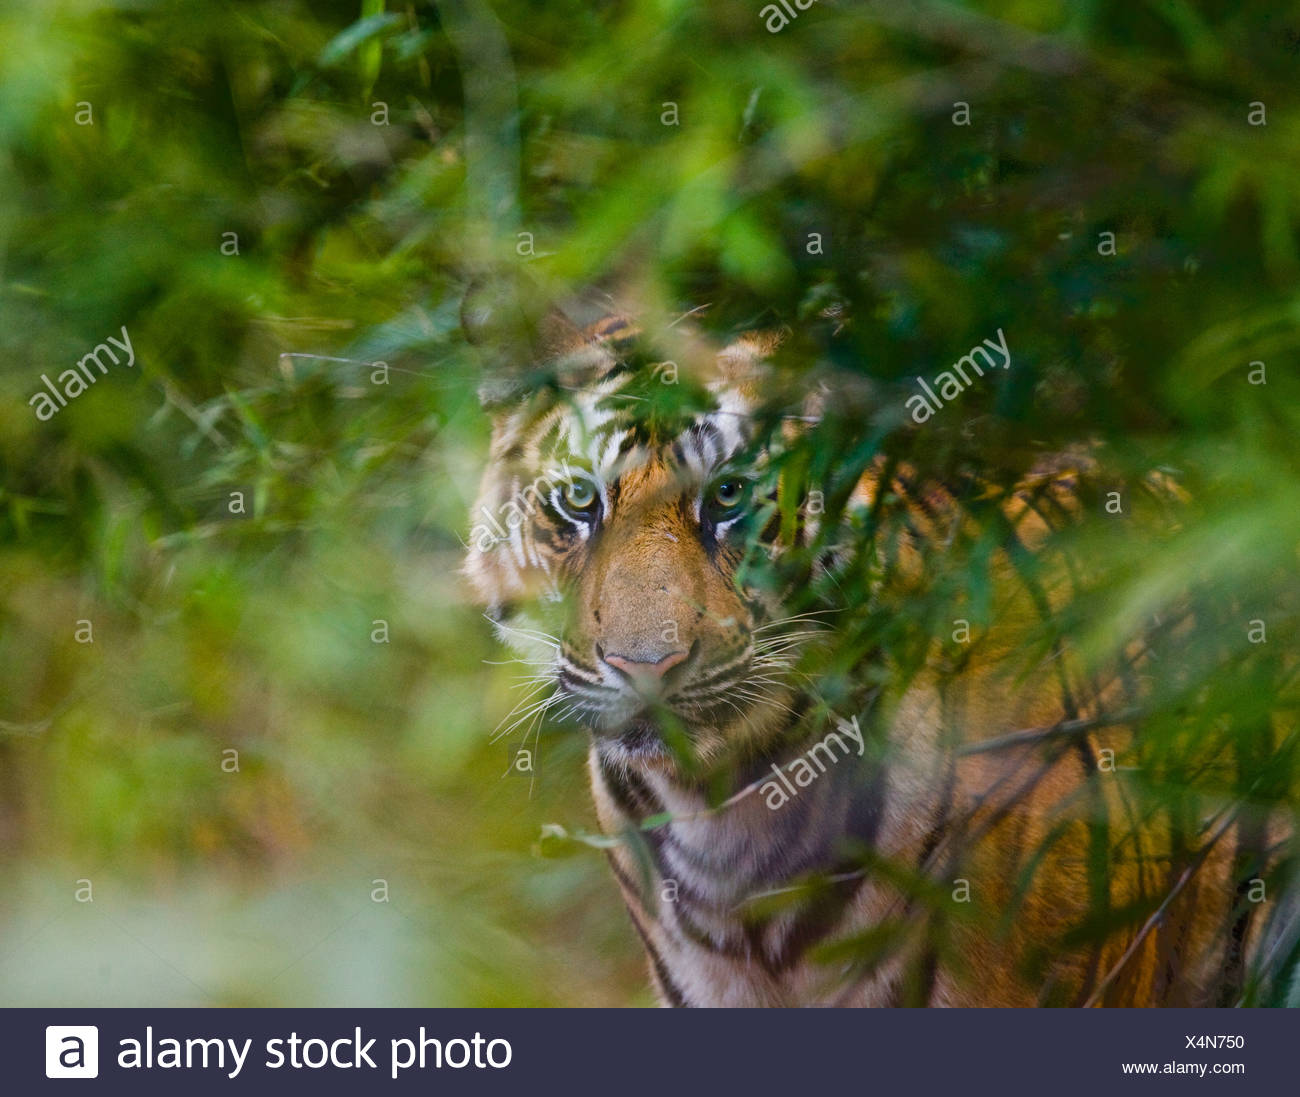 Indian Tiger, Bandhavgarh National Park, India (Panthera tigris) Immagini Stock